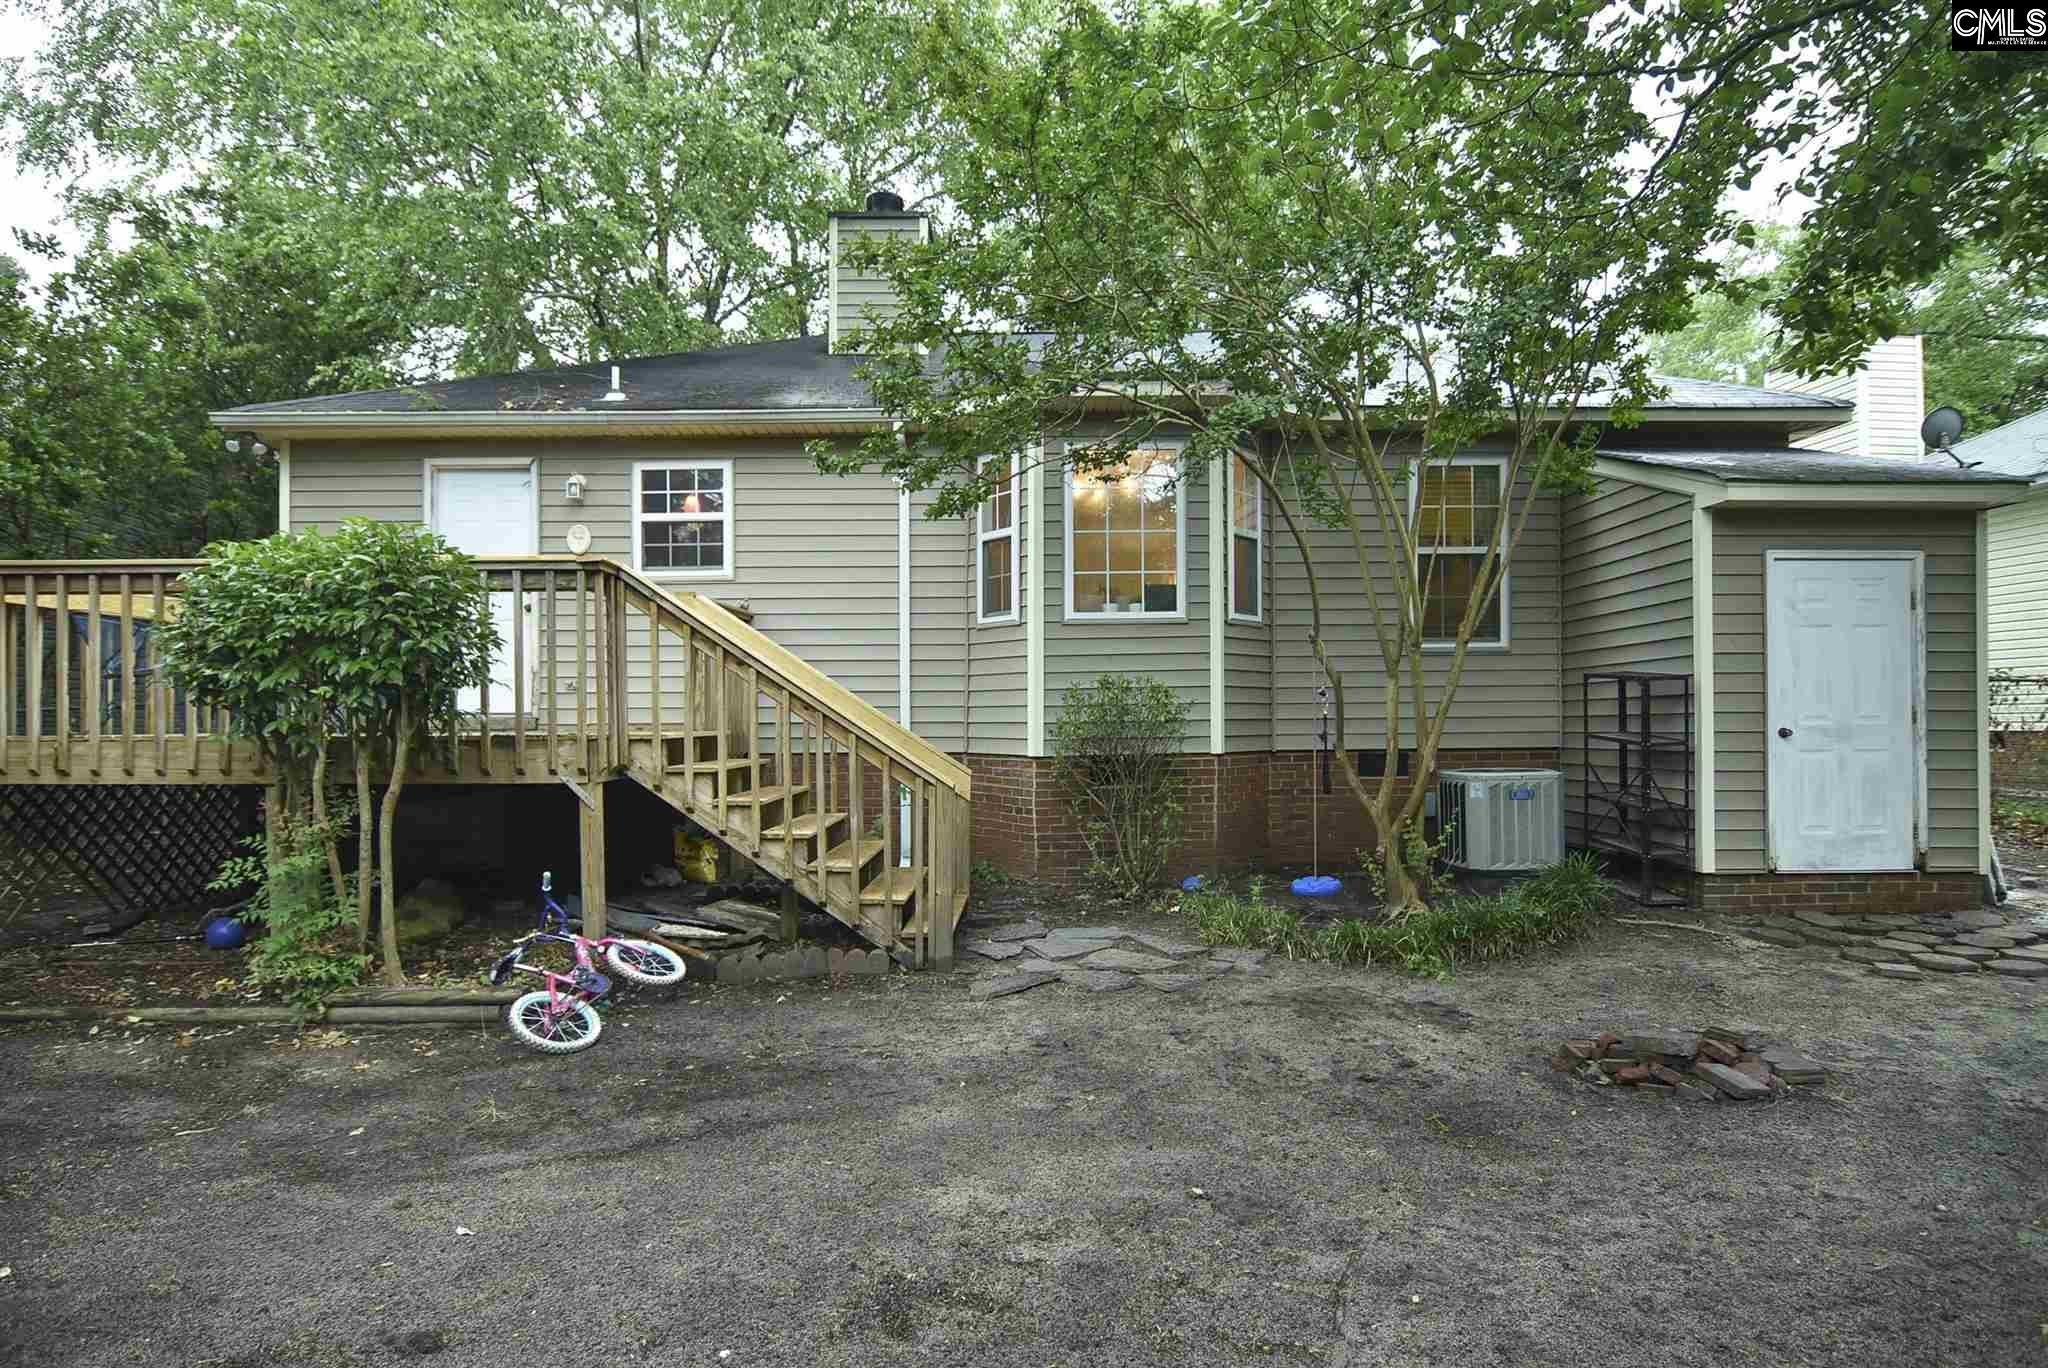 4021 Hickory Columbia, SC 29205-4633